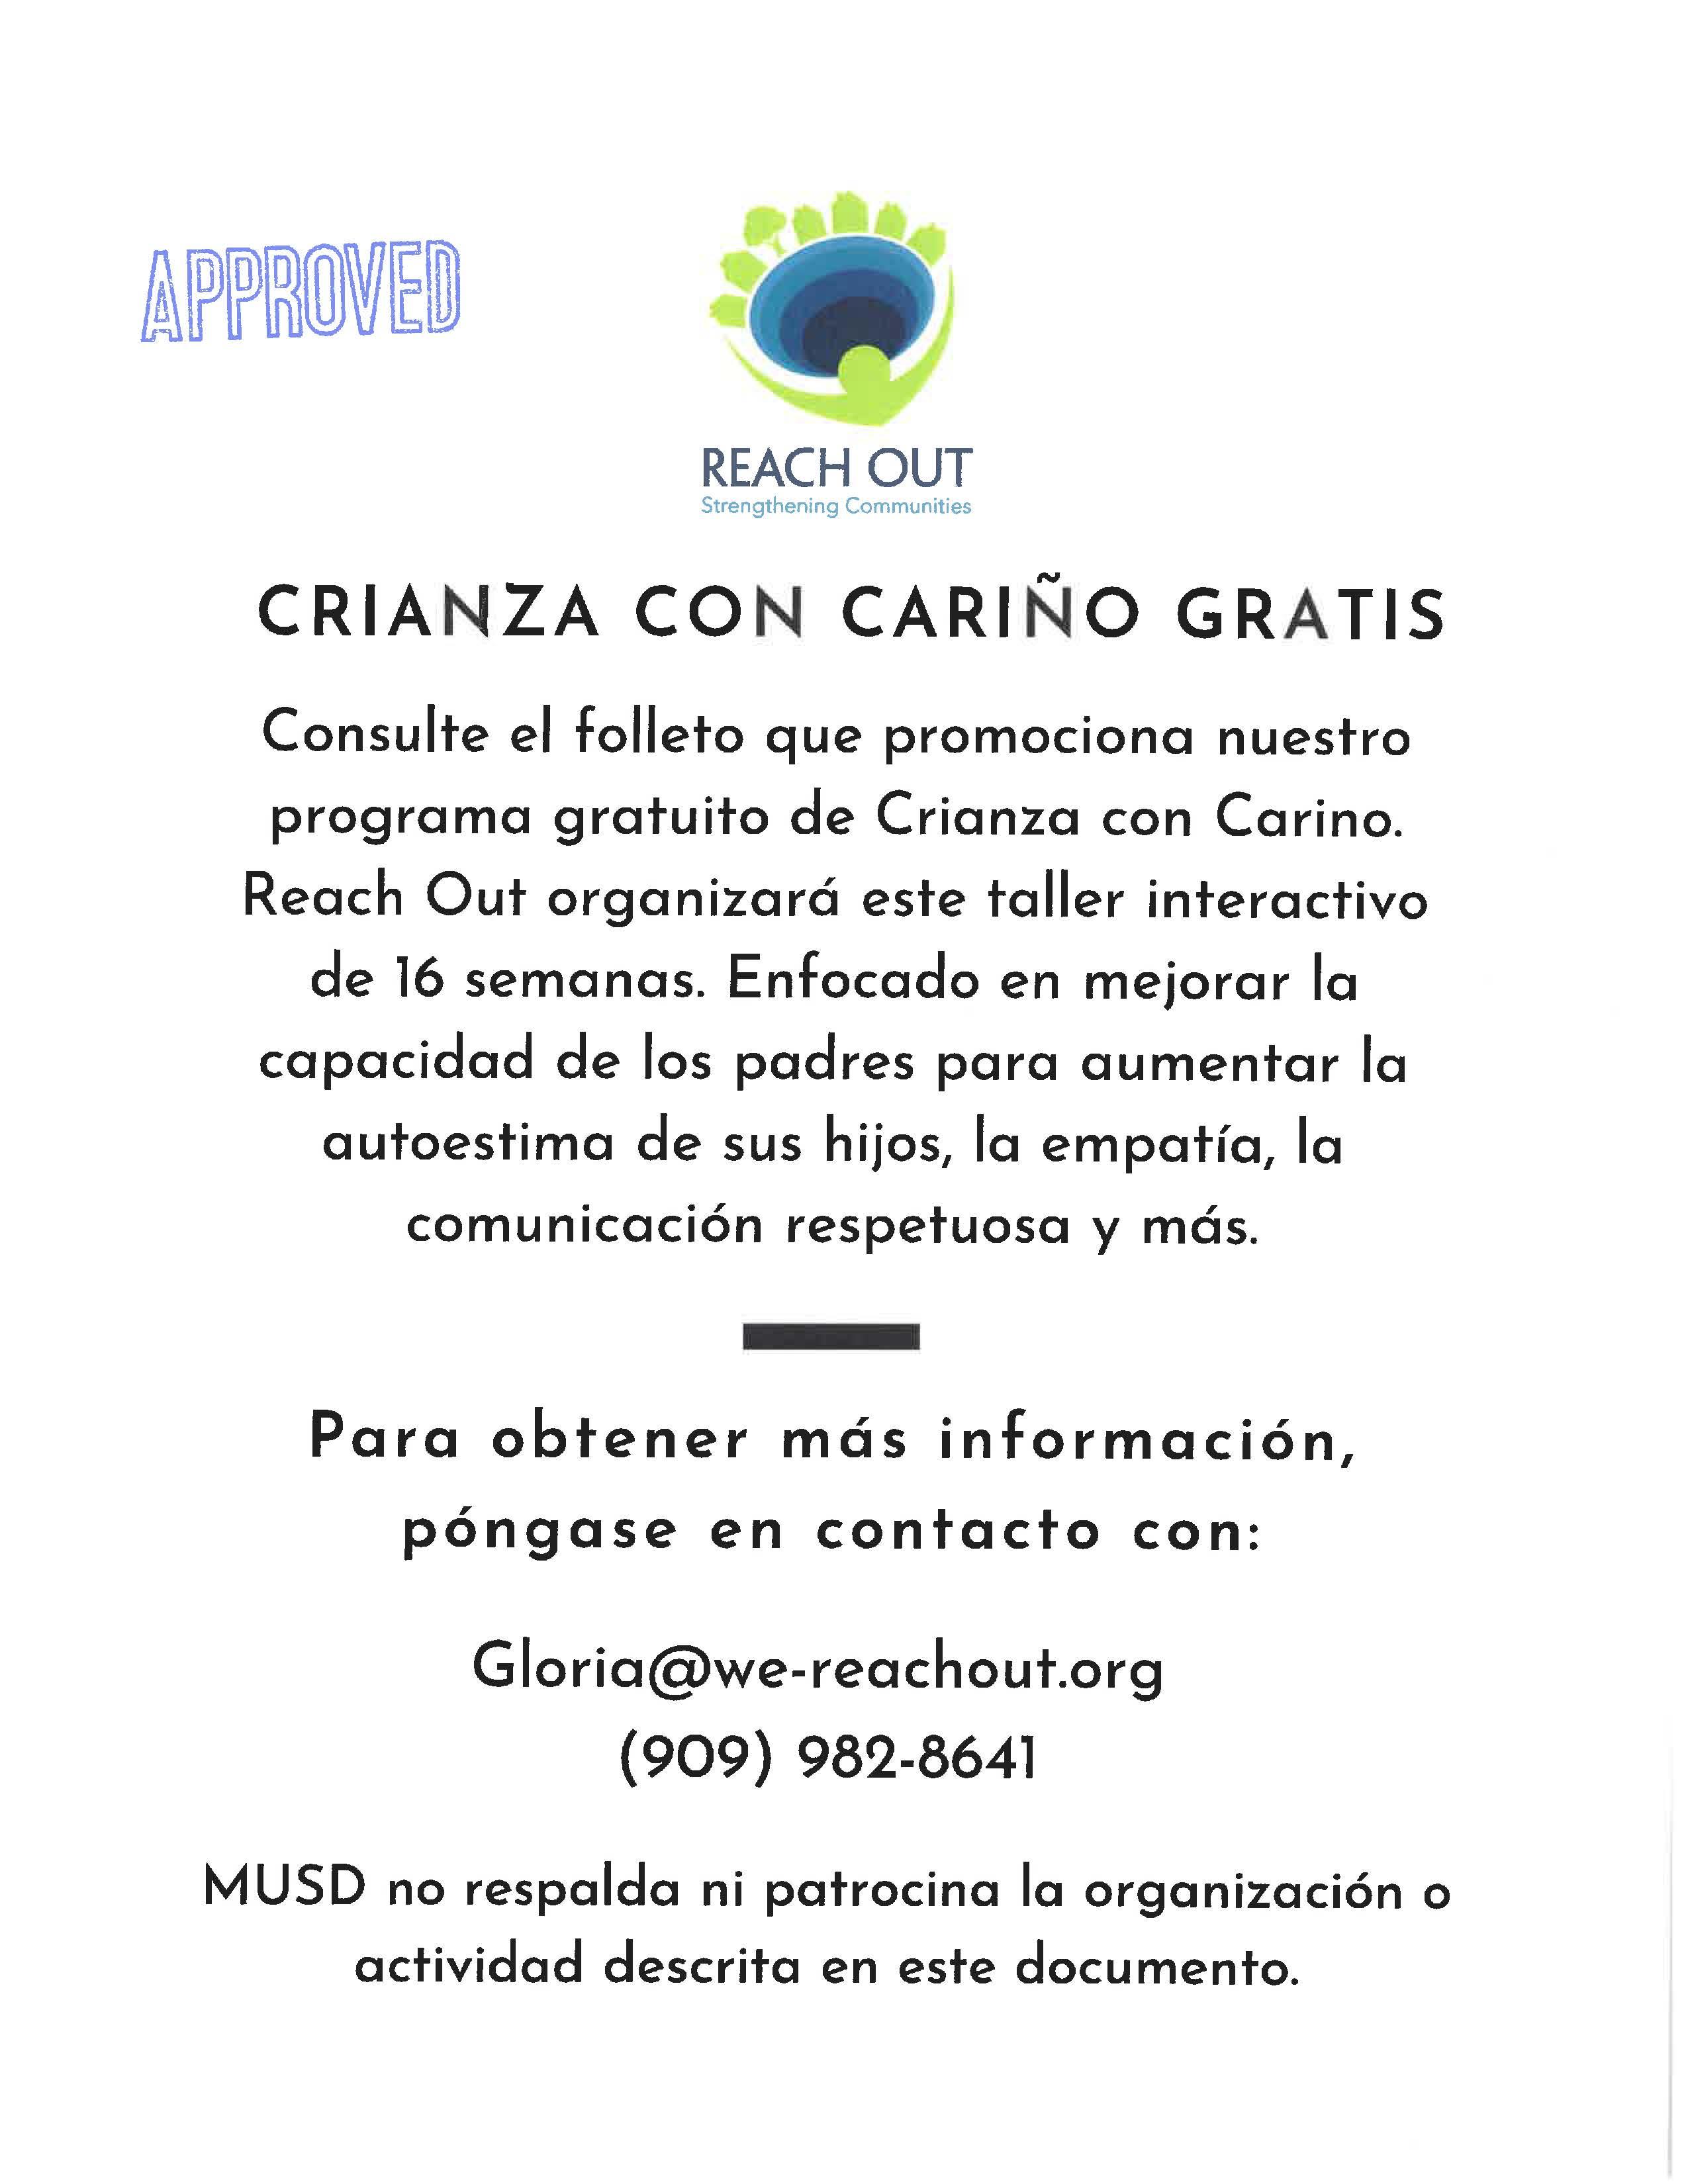 Free Nurturing Parenting Workshop (Crianza con cariño gratis) pg. 2, Español click for .pdf